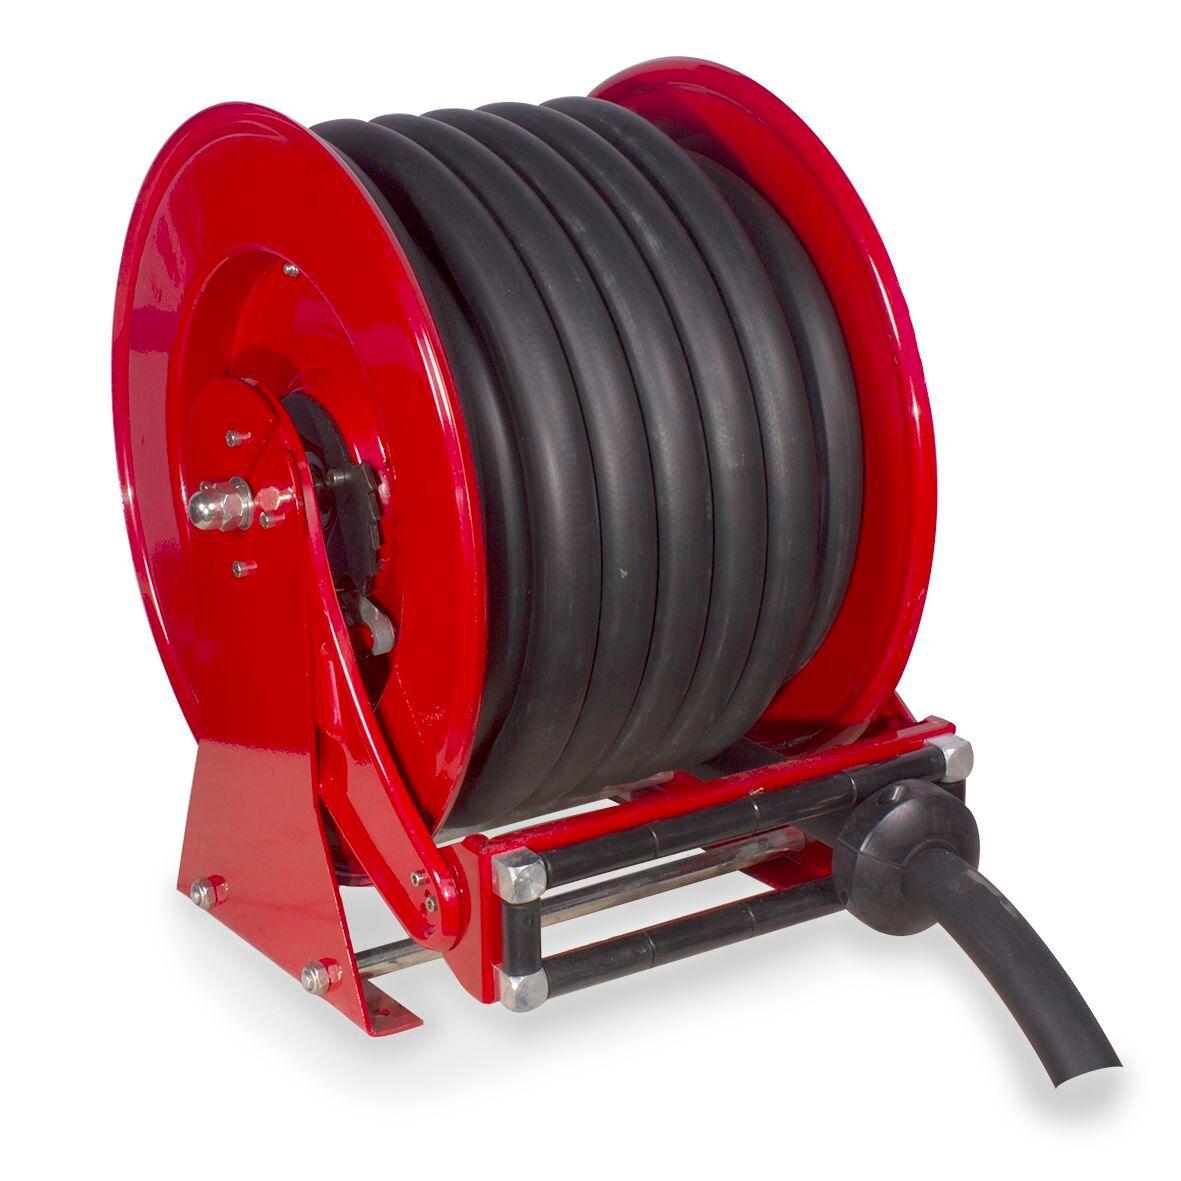 Mw-tools Enrouleur diesel 15 m - 1 MW-Tools SHD1015